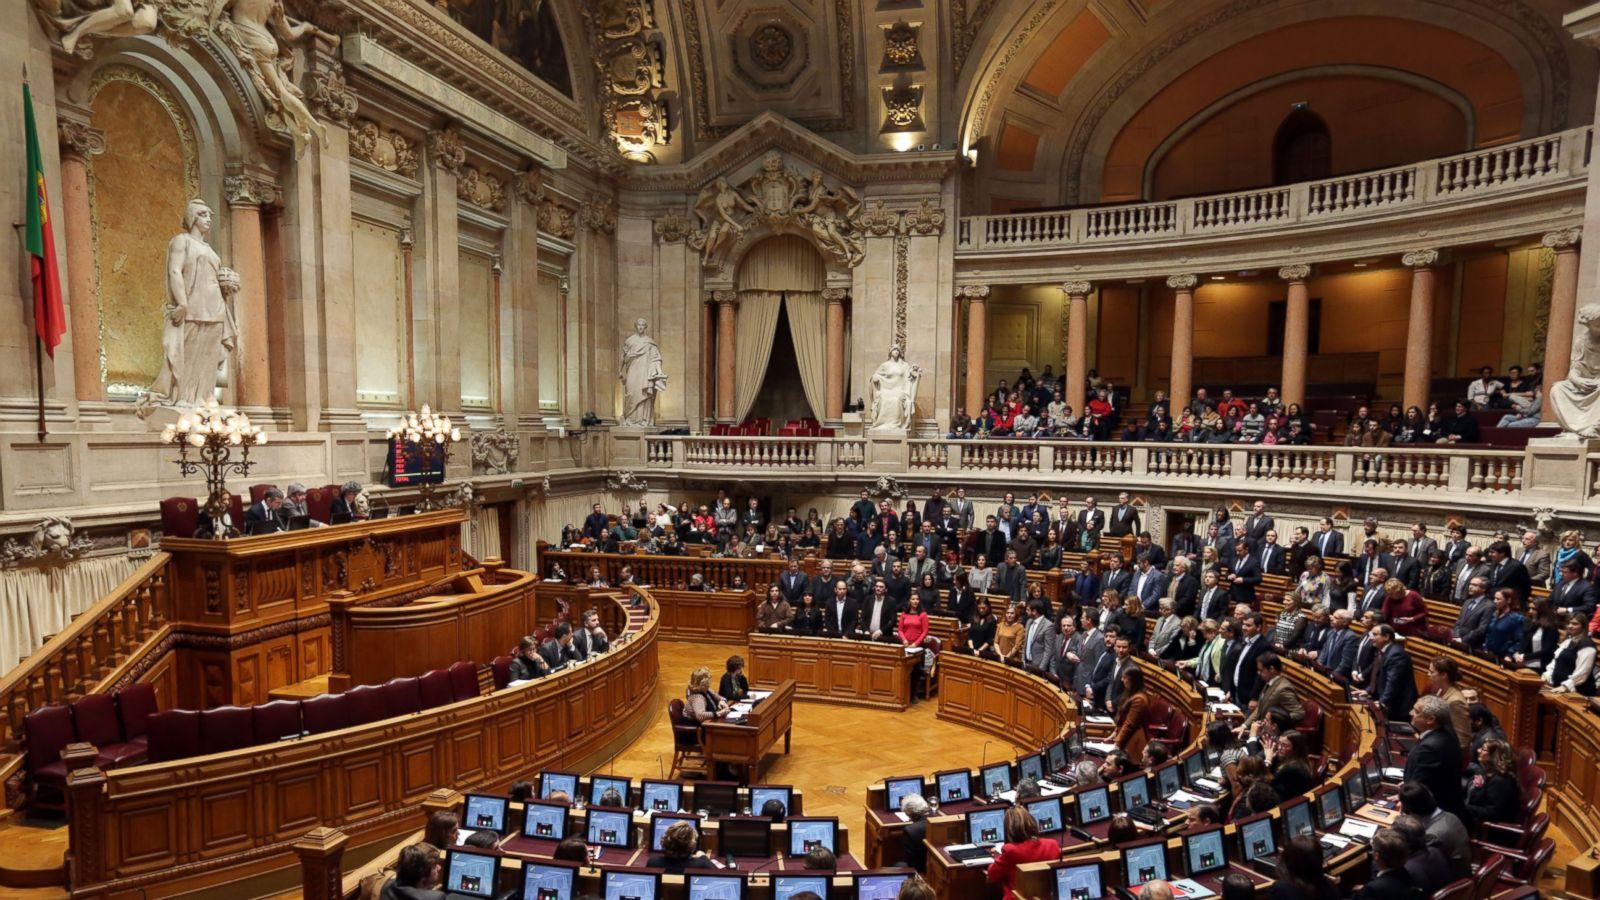 Будівля парламенту Португалії